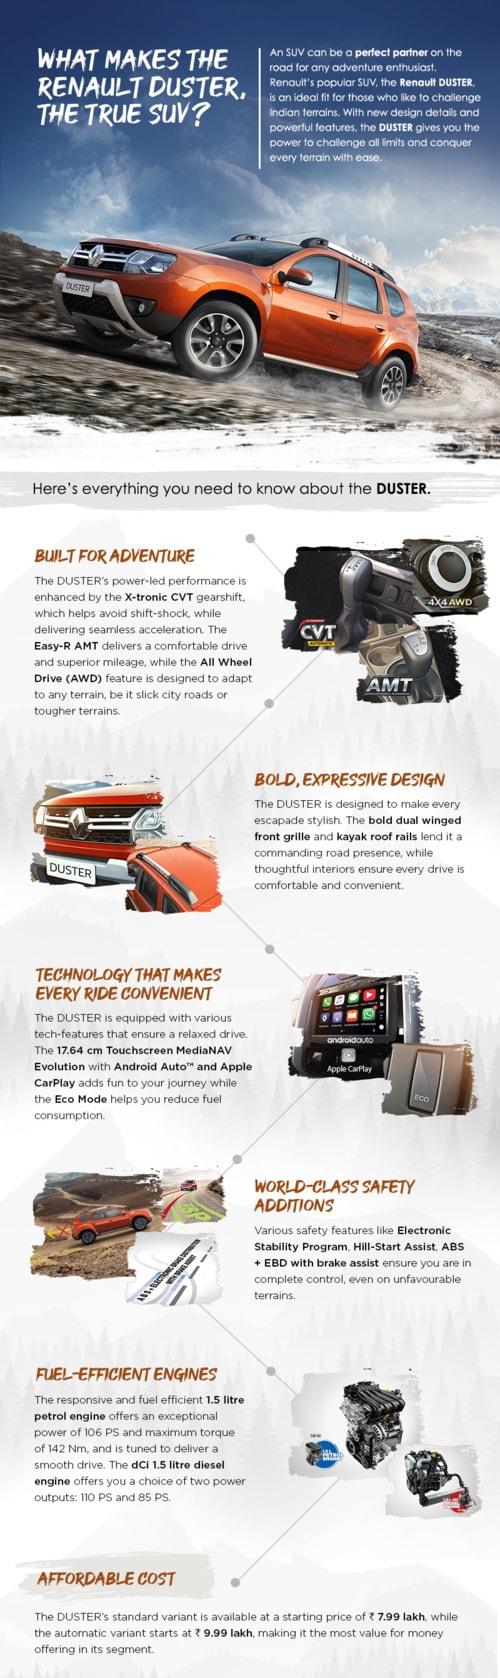 What makes the Renault DUSTER, the true SUV? via Manas Sharma